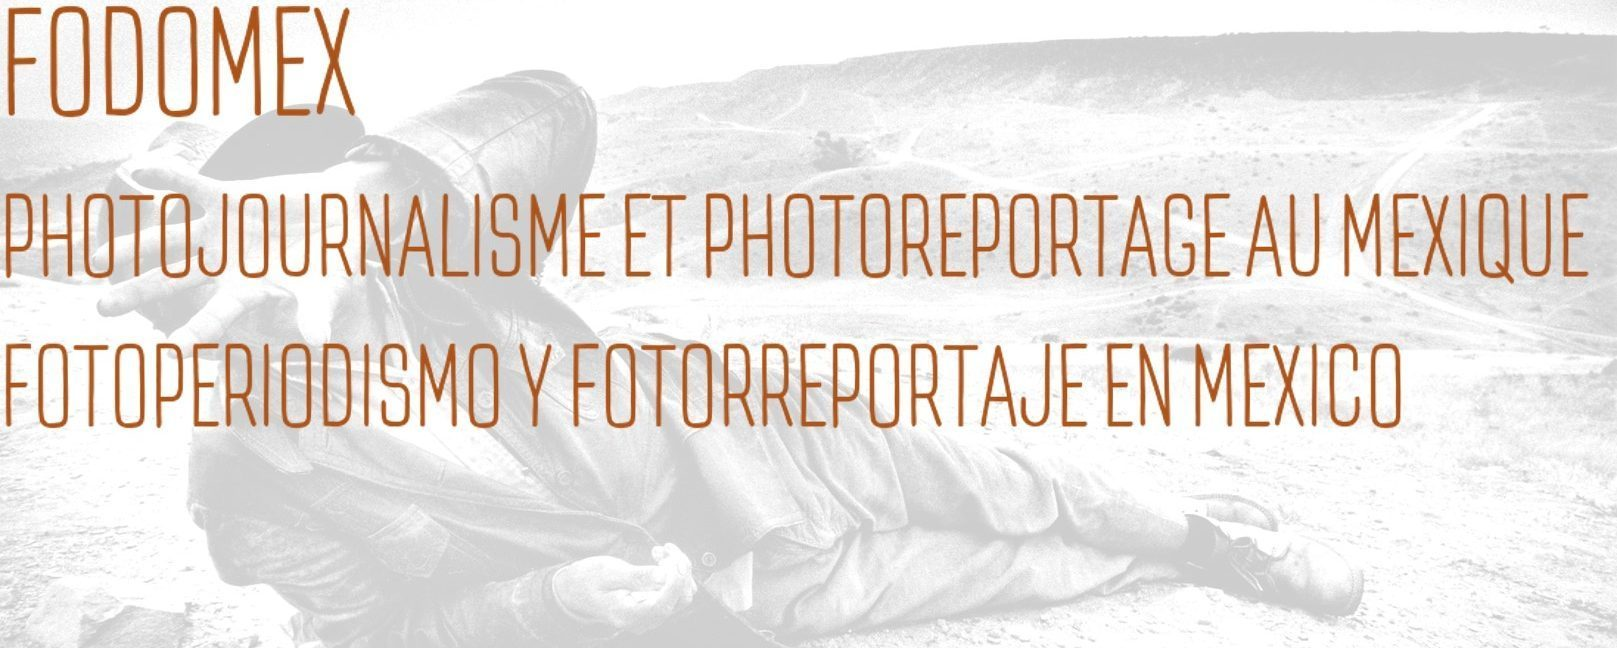 Fodomex. Photojournalisme et photoreportage au Mexique